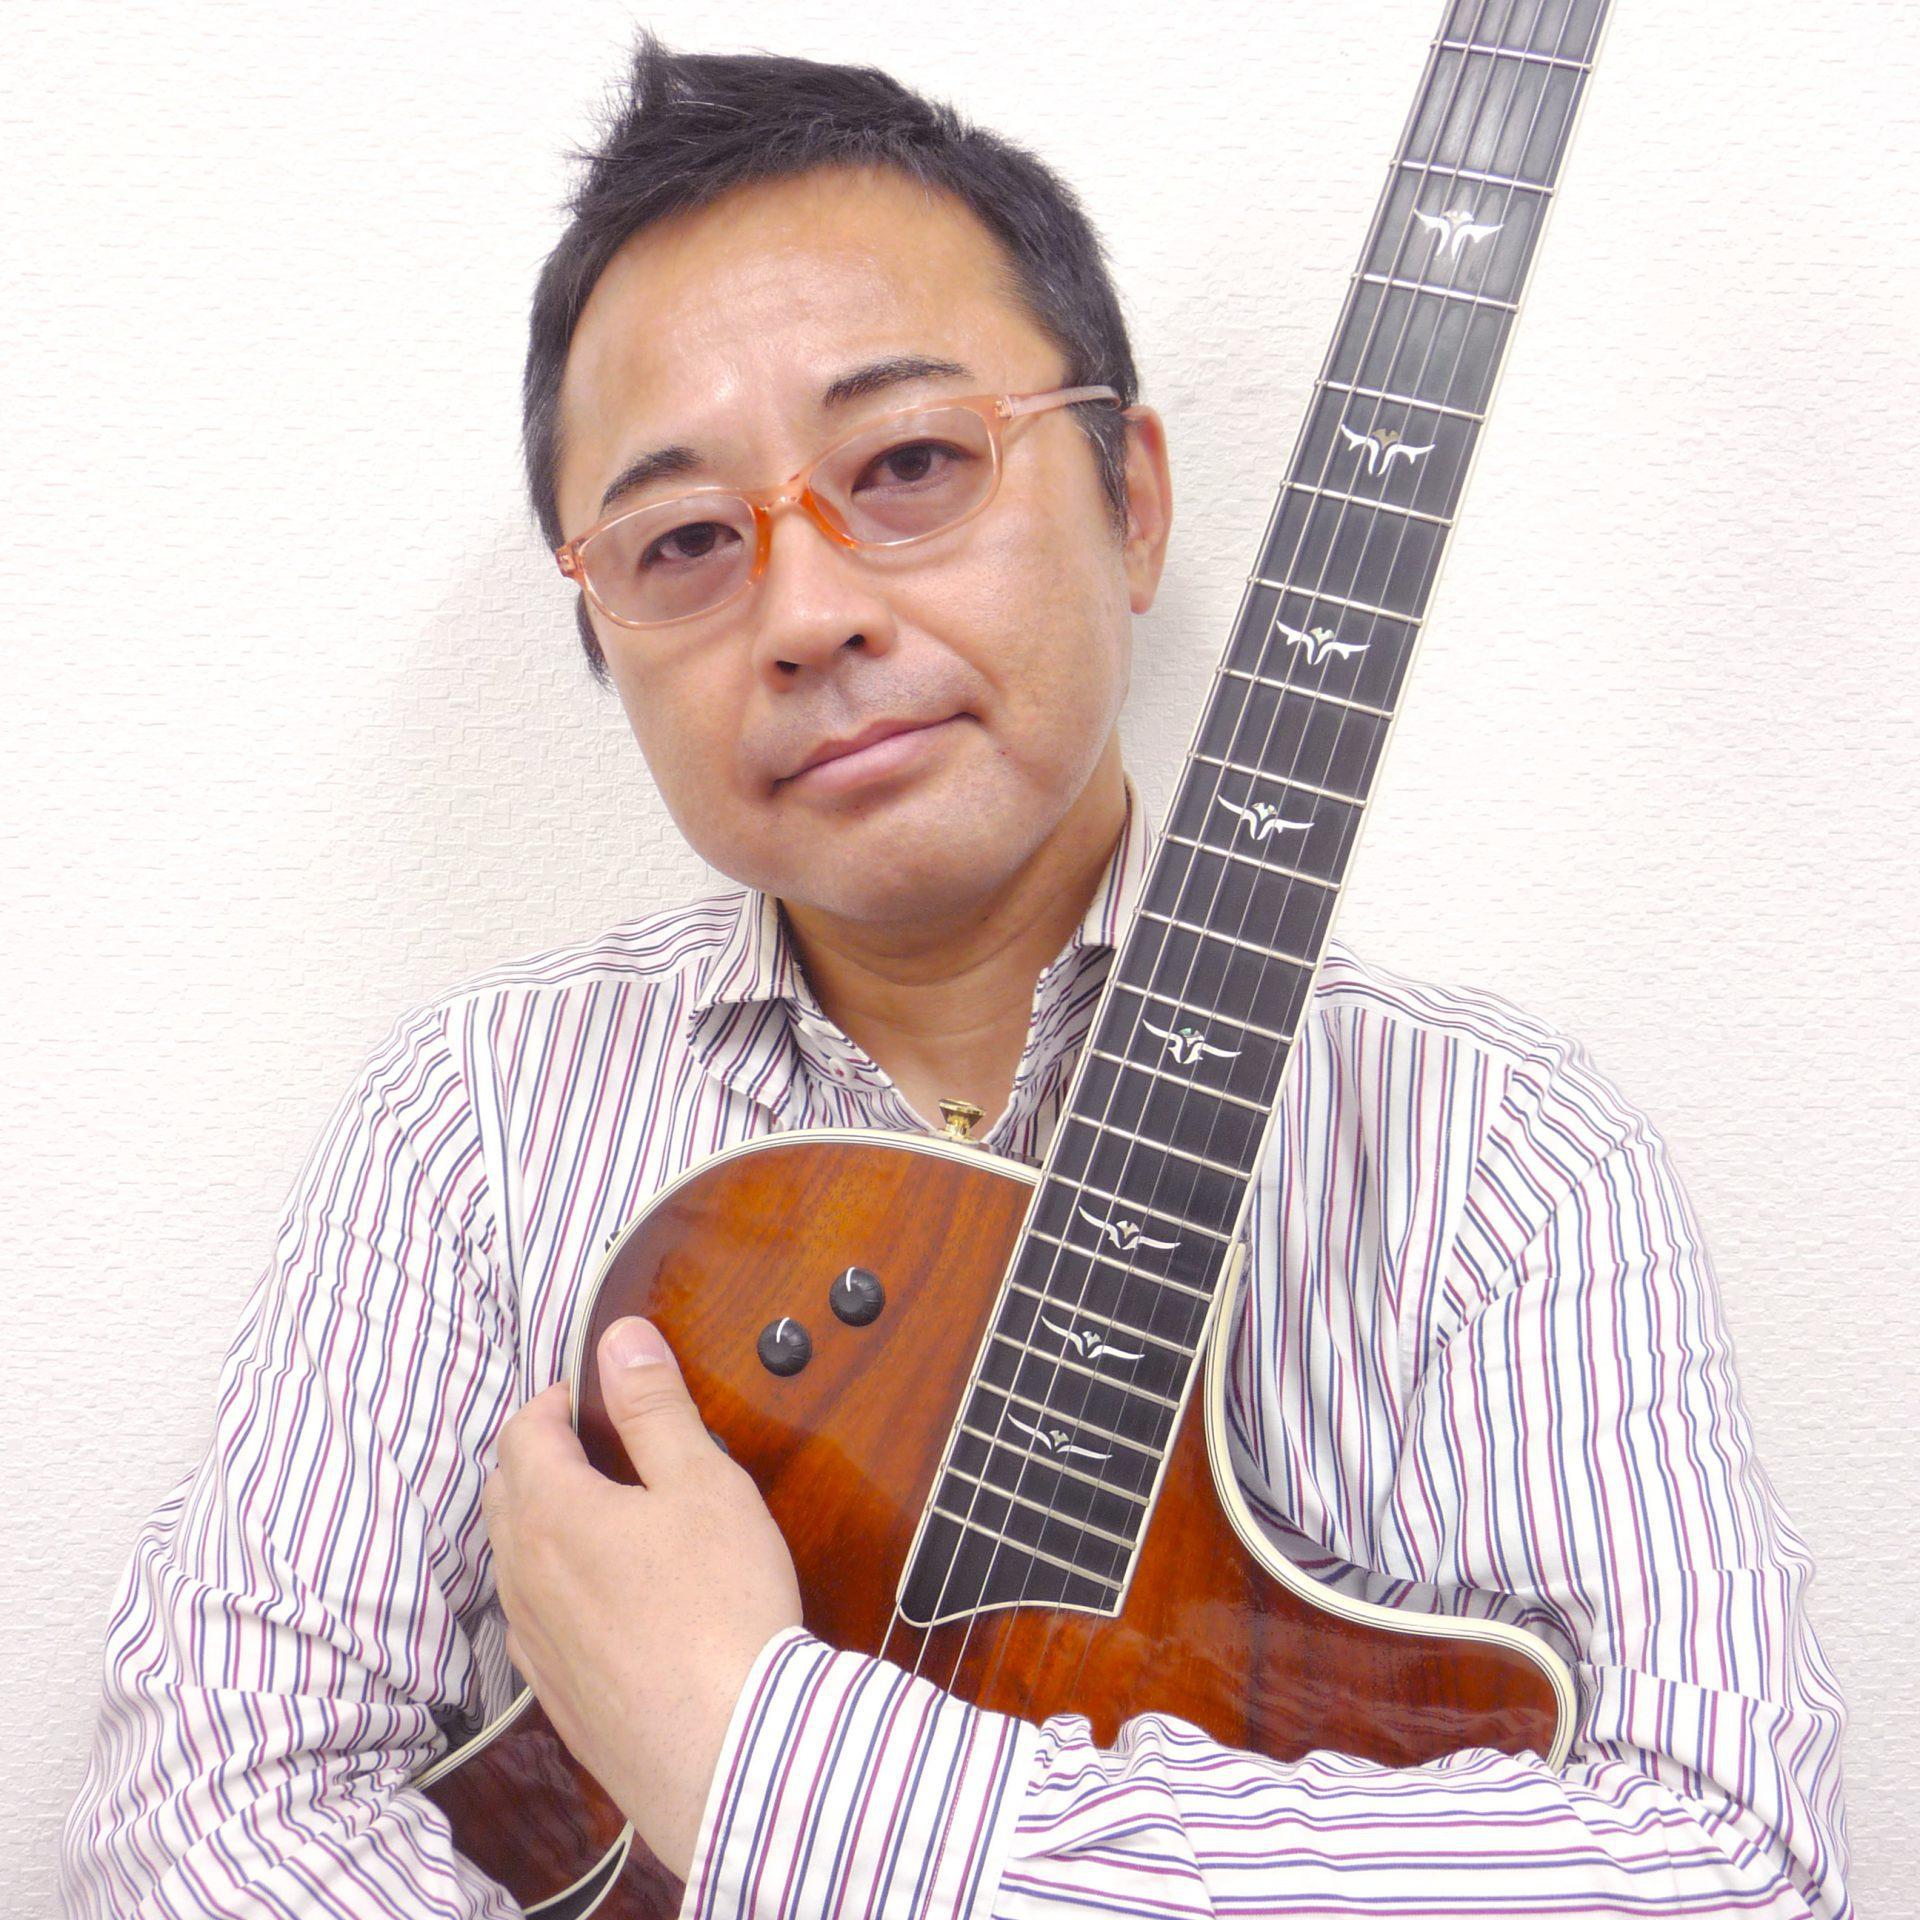 Gt 近藤裕介